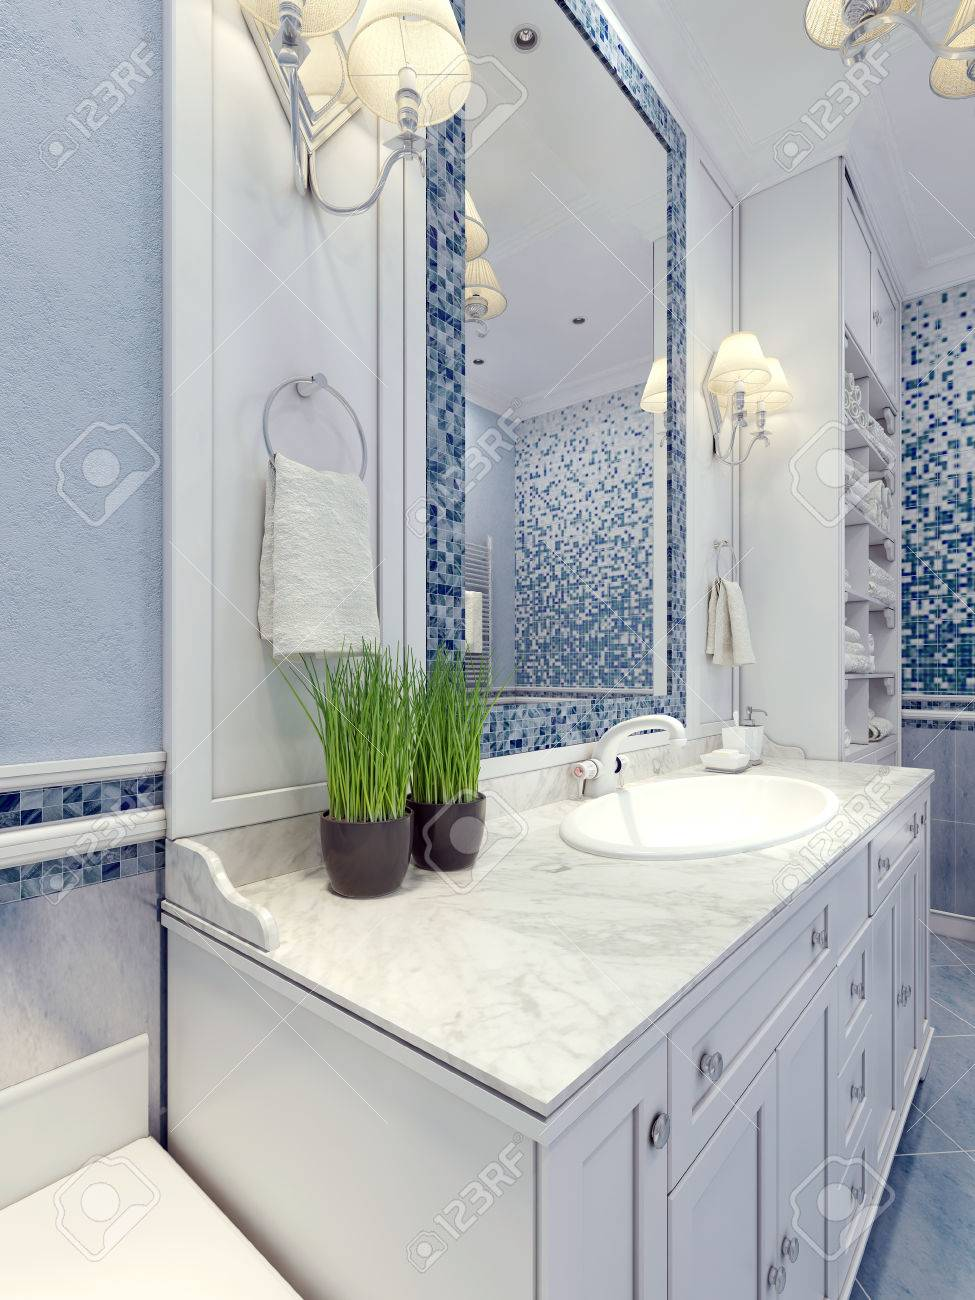 Provence salle de bain bleu tendance. Meubles de salle blanche. Un grand  miroir avec cadre mosaïque de bleu, blanc consoles mélangeur d\'évier. 3D ...